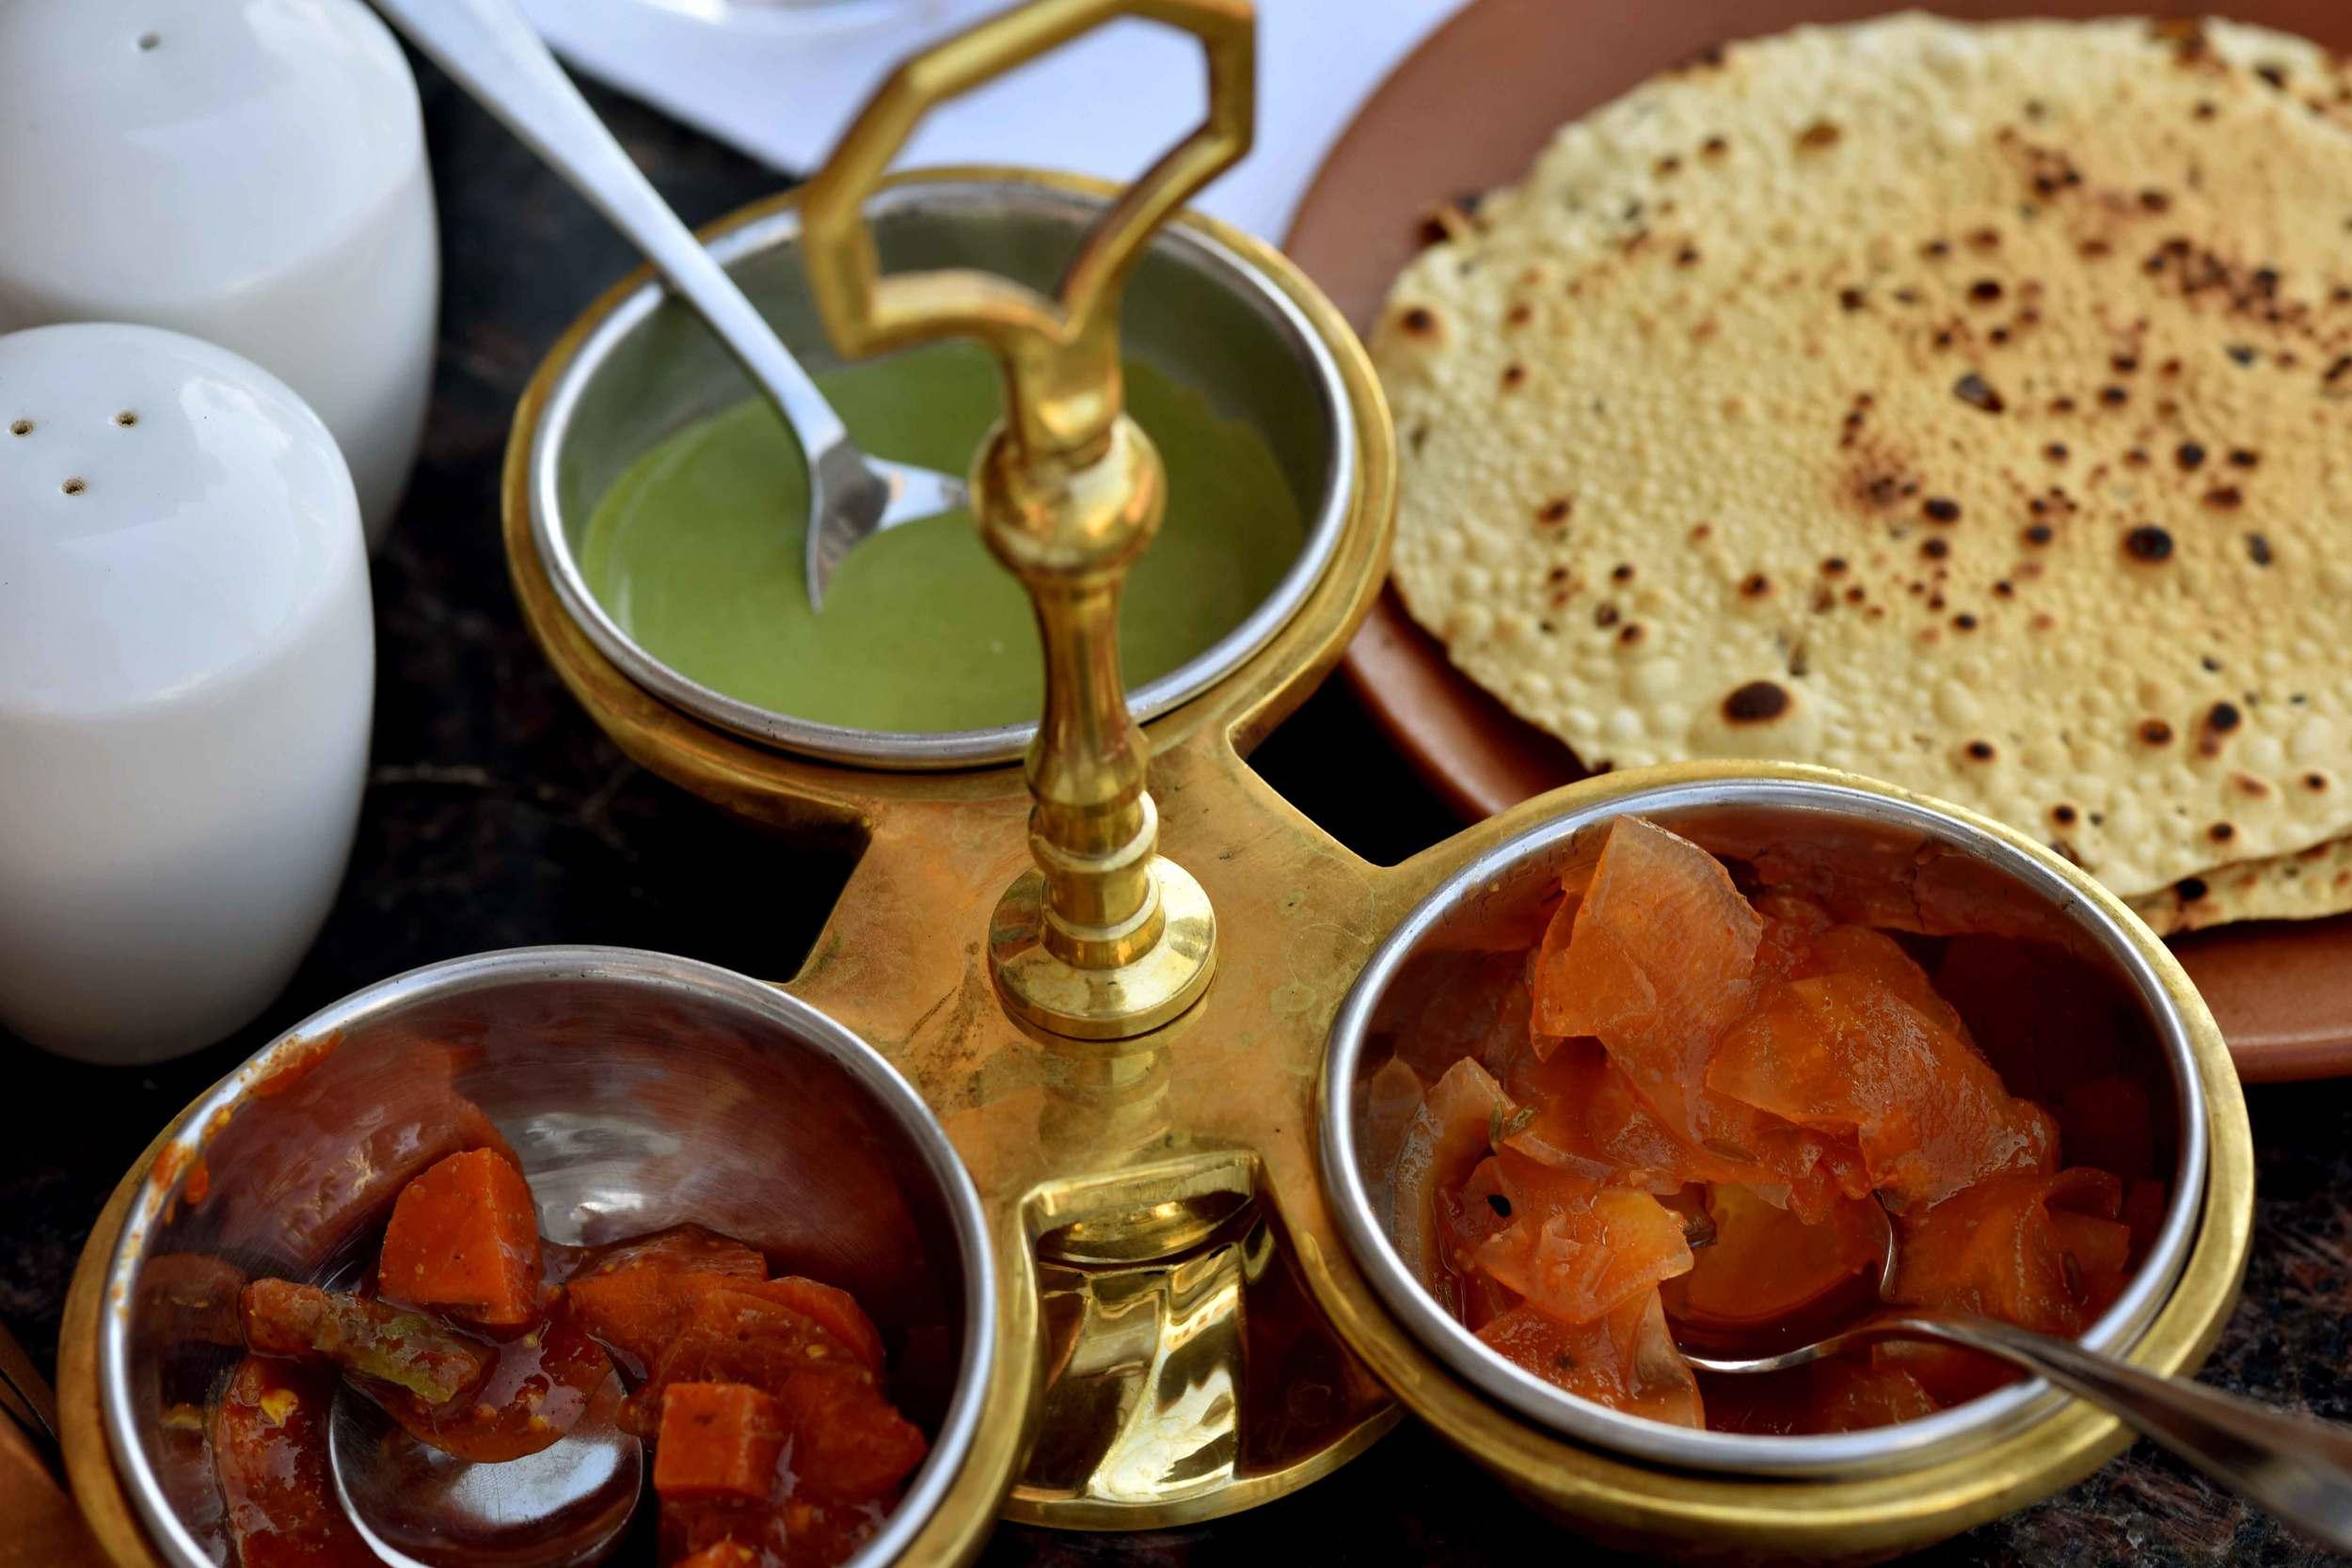 Indian cuisine, Park Hyatt Hotel, Goa, image©sourcingstyle.com.